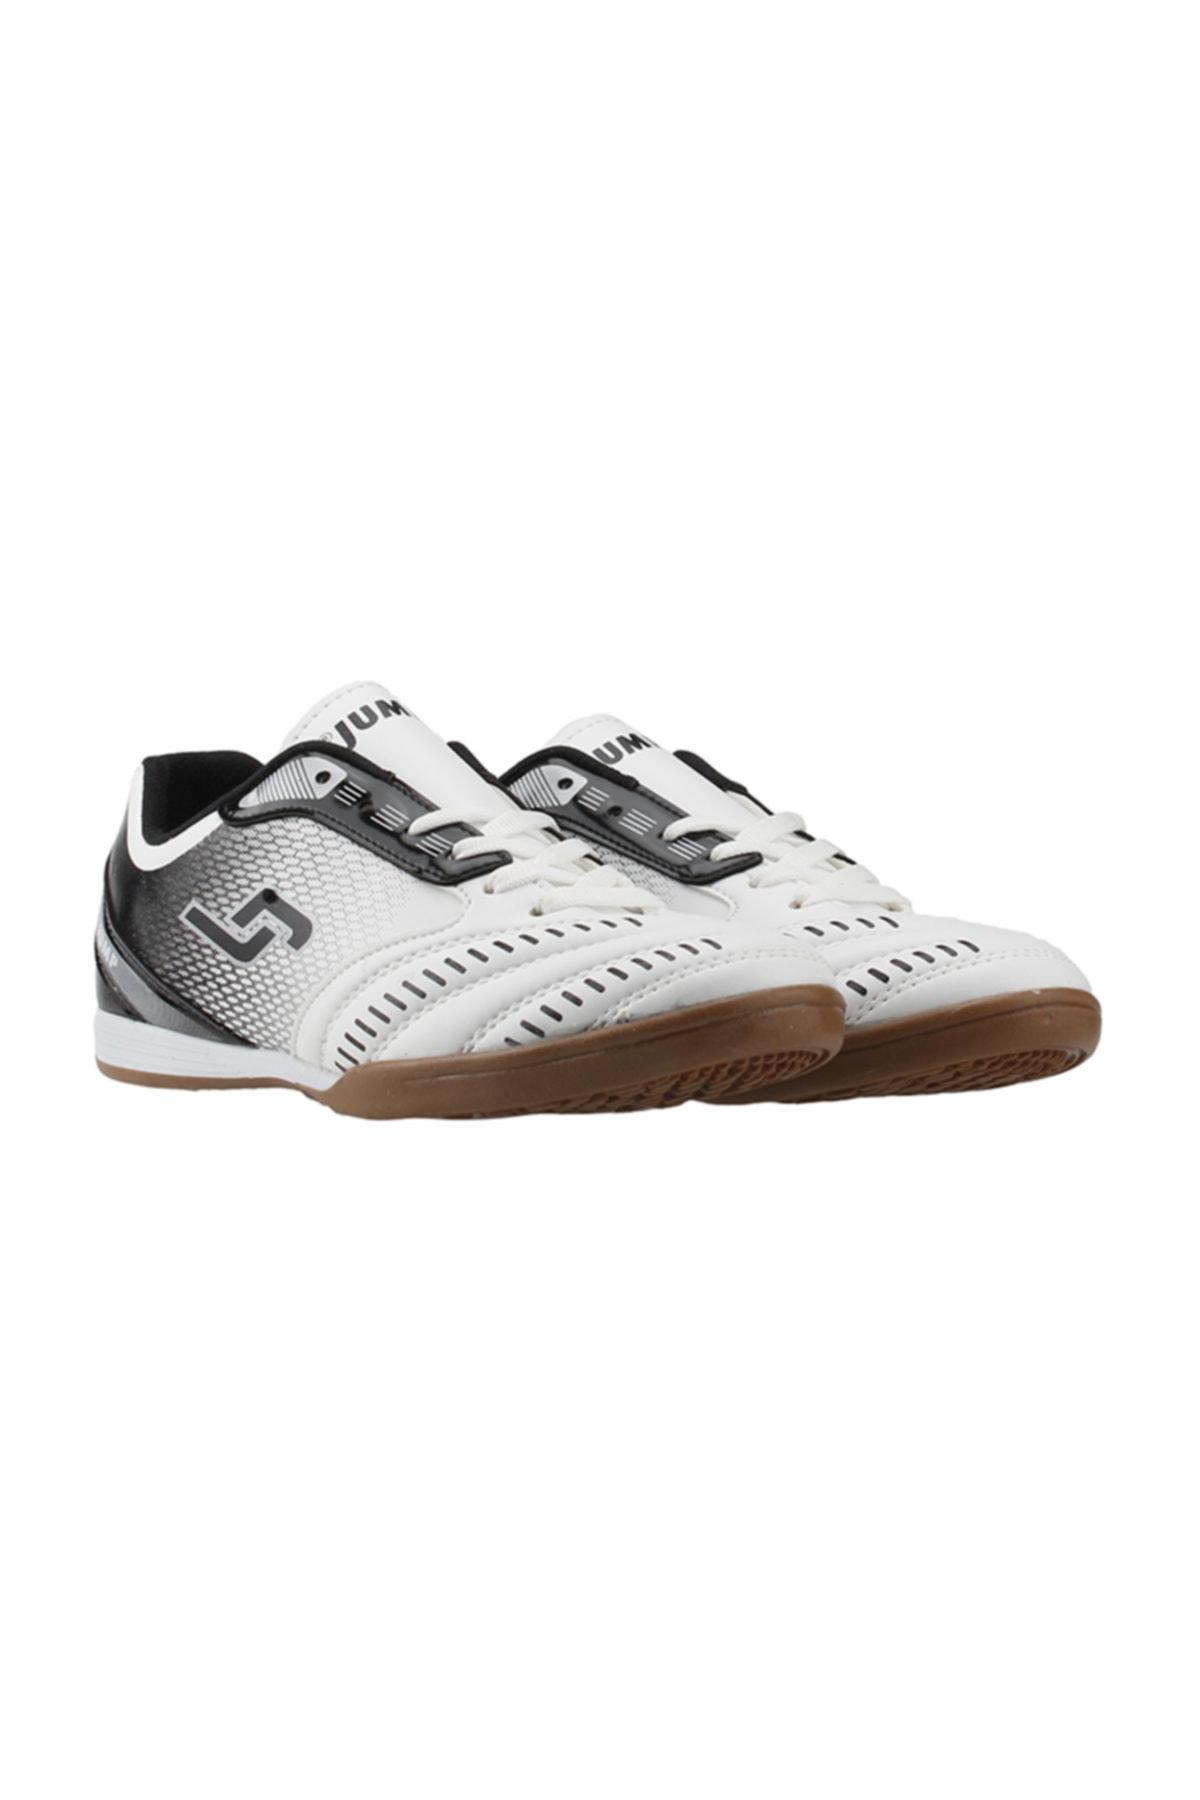 فروشگاه کفش والیبال مردانه سال 1400 برند Jump رنگ لاجوردی کد ty34553579